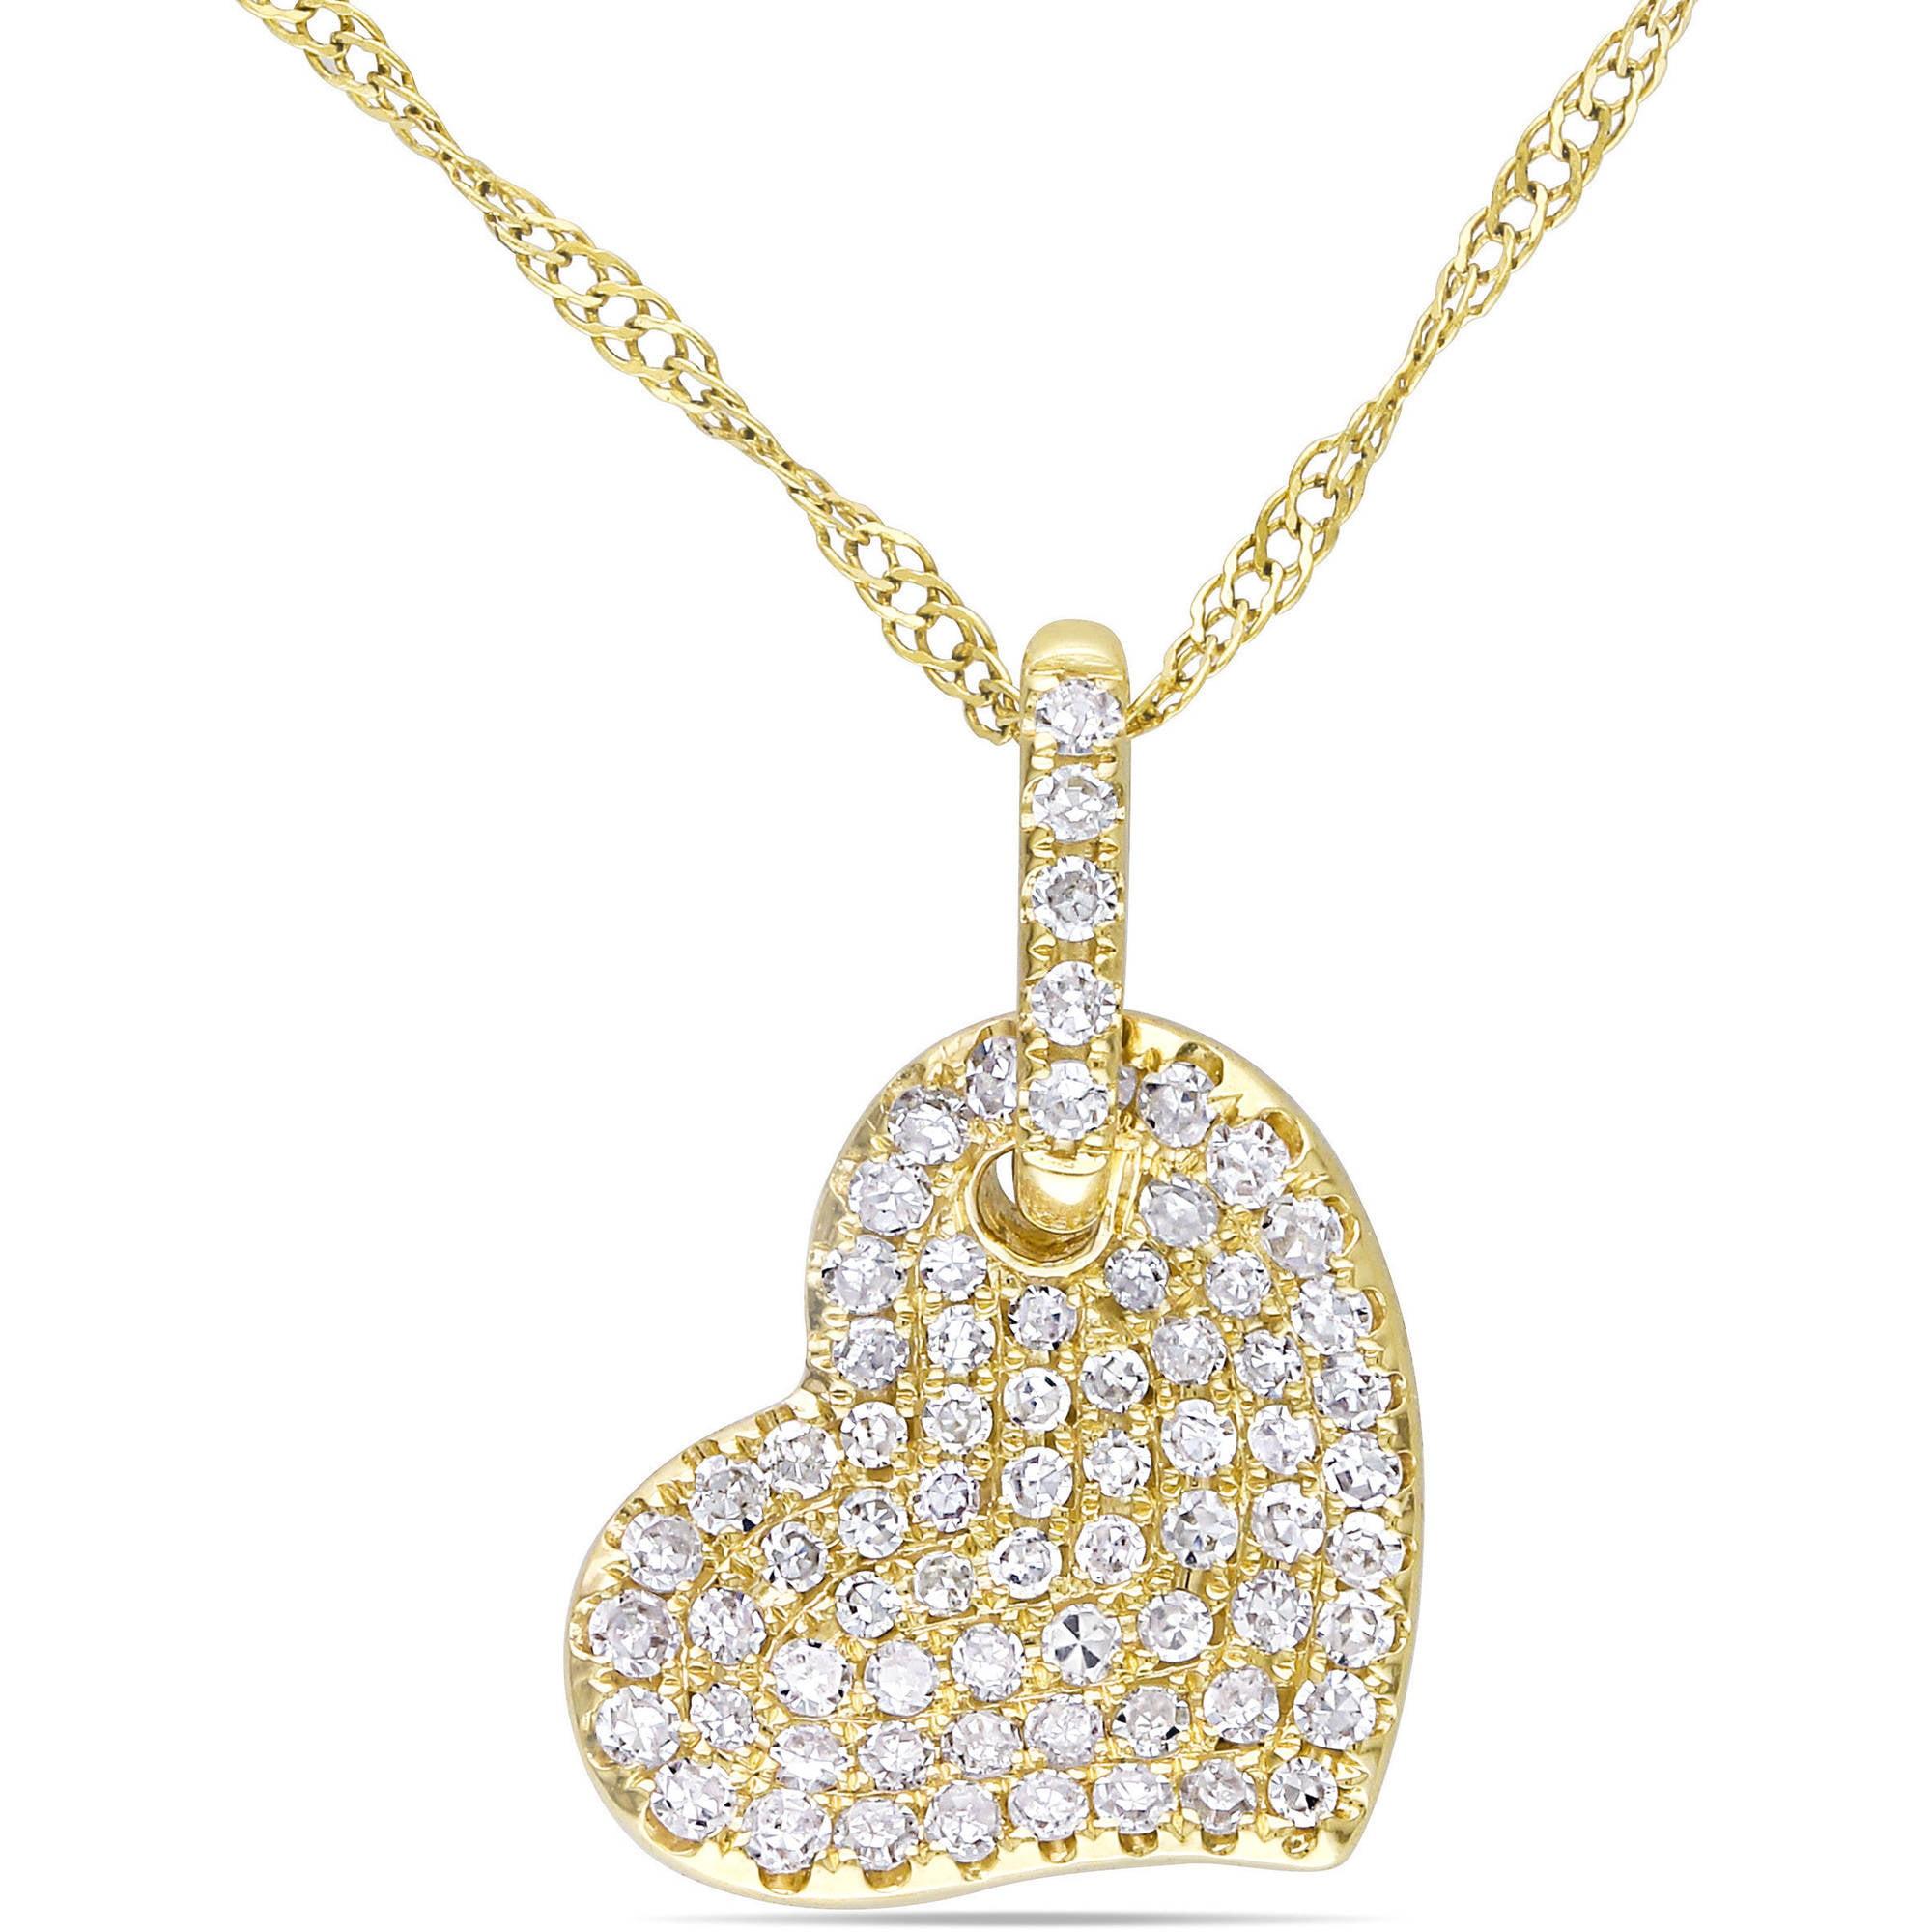 "Miabella 1 4 Carat T.W. Diamond 14kt Yellow Gold Heart Pendant, 17"" by Miabella"